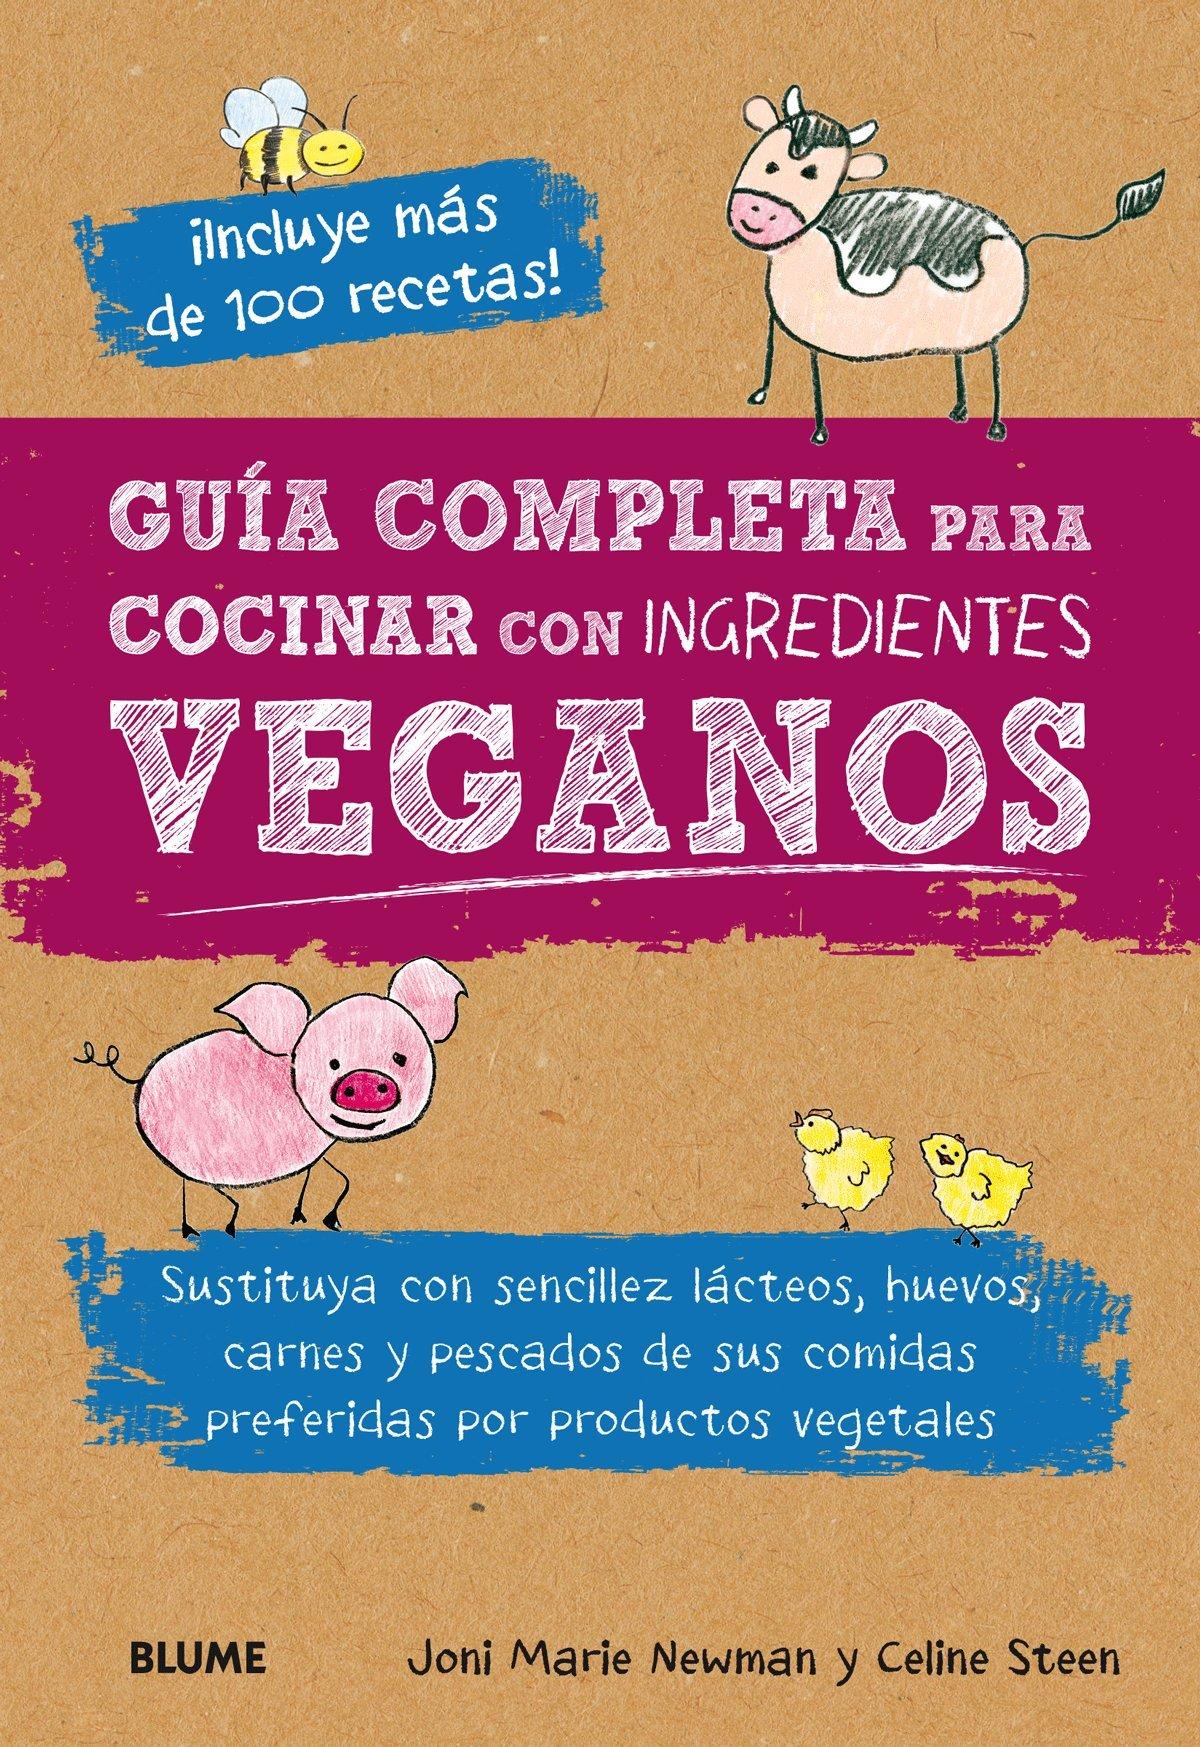 Guía completa para cocinar con ingredientes veganos ...